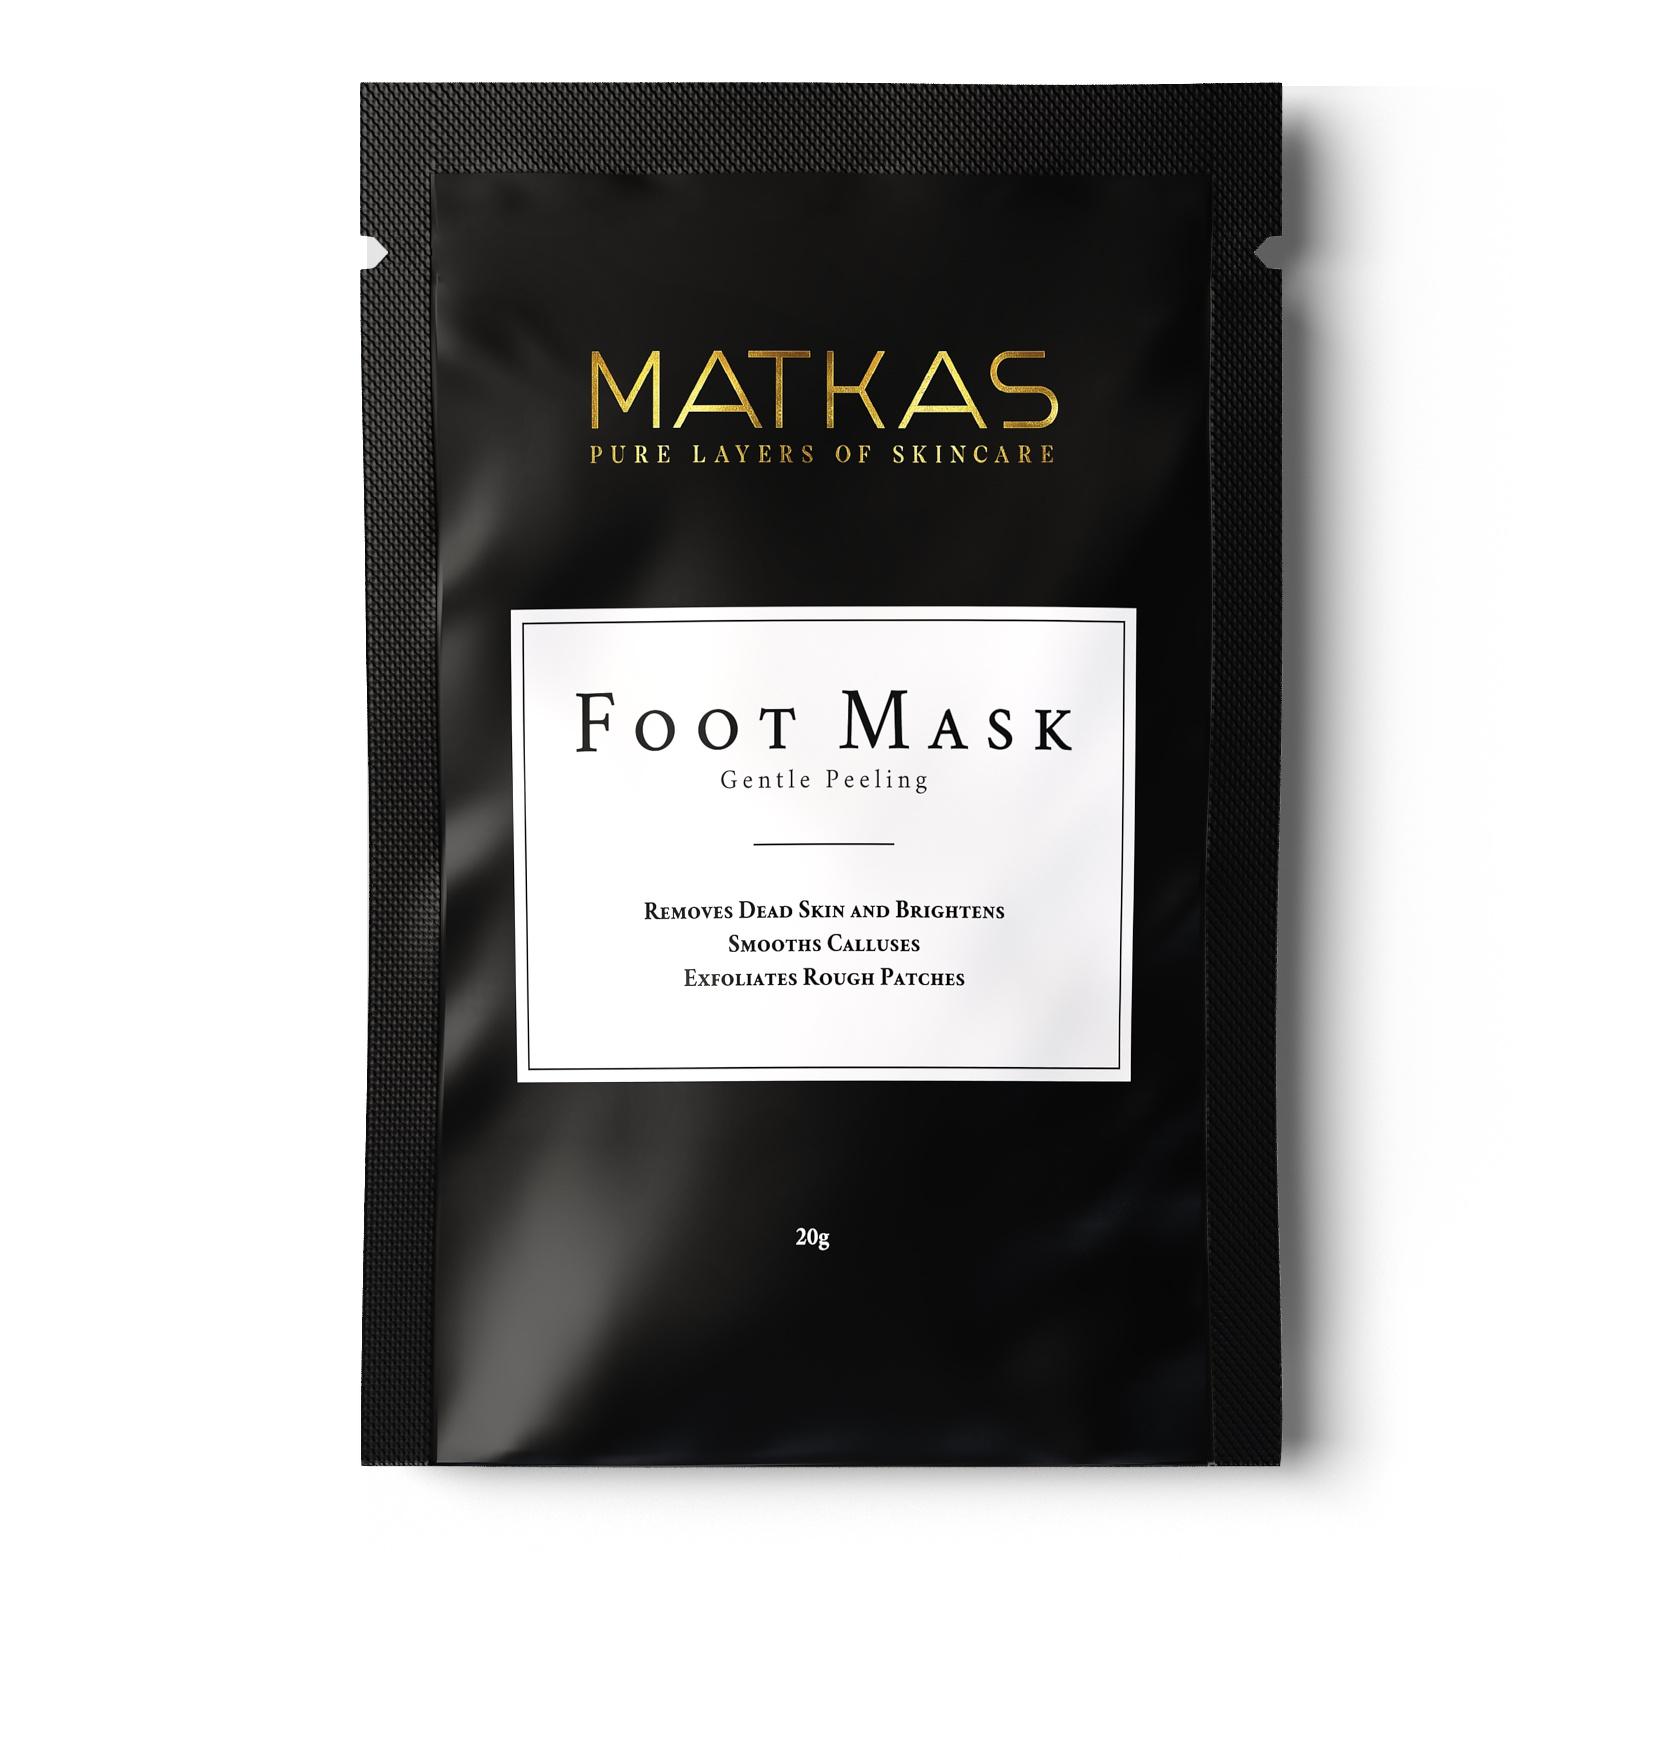 MATKAS Foot Mask Gentle Peeling